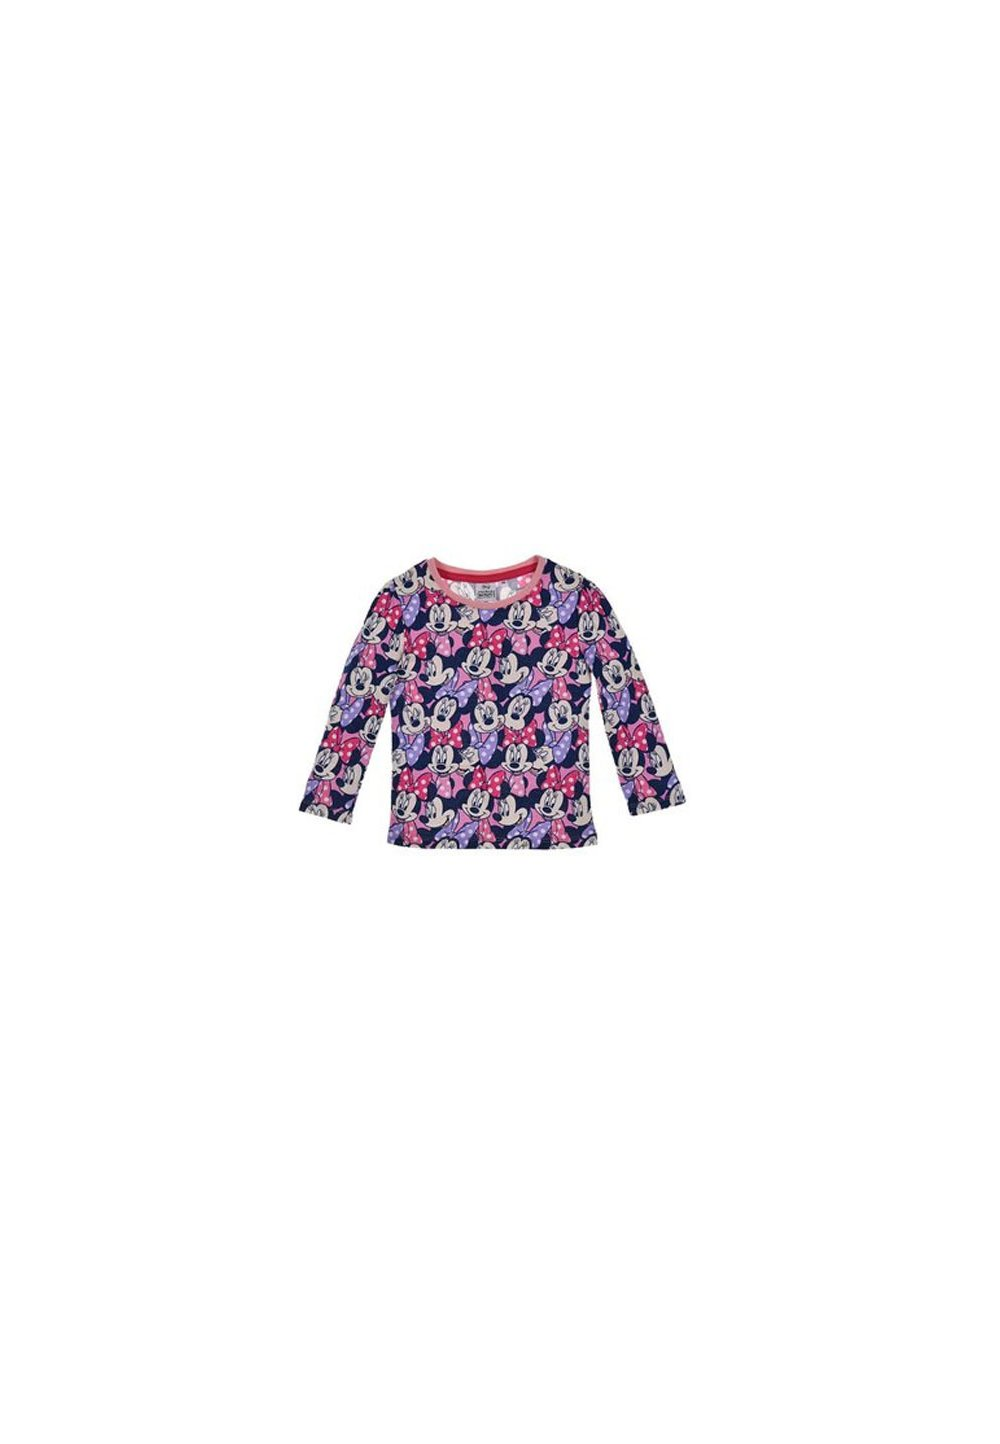 Bluza roz, figurine Minnie Mouse imagine